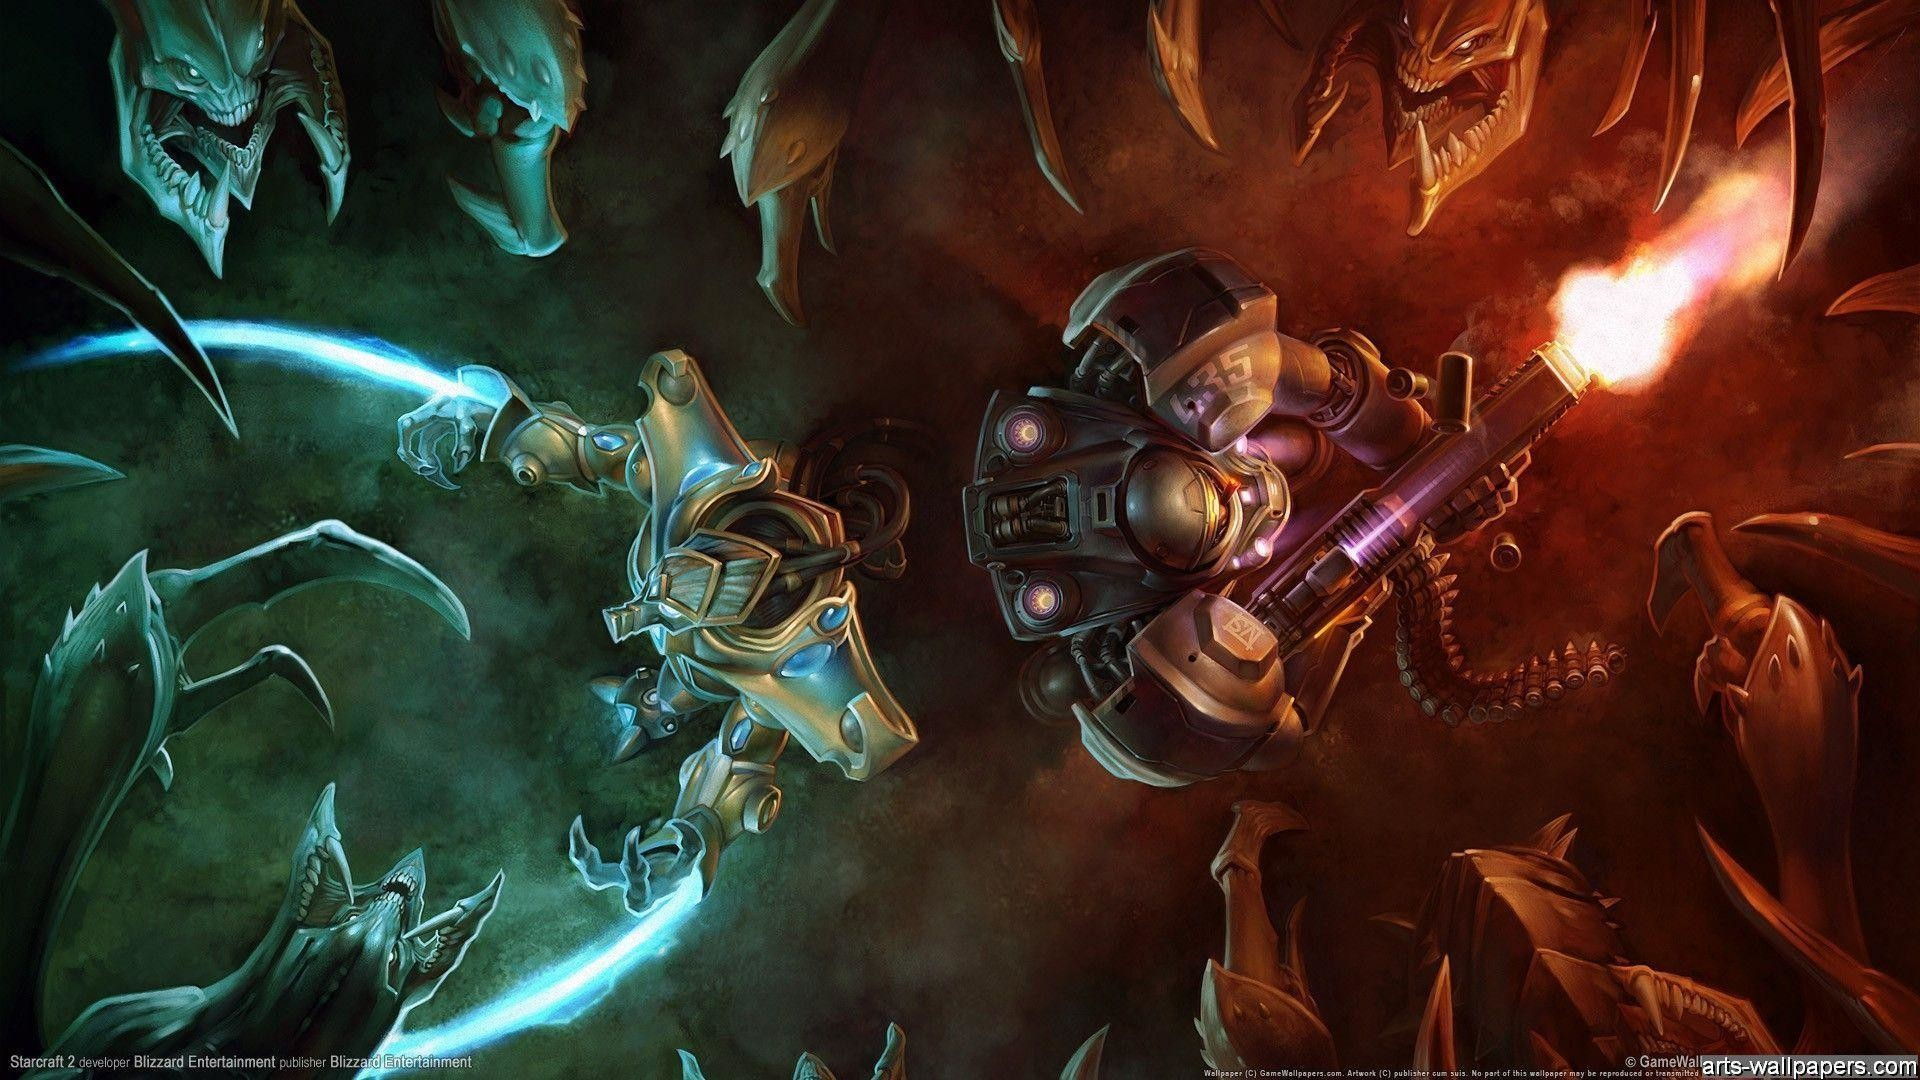 Blizzard Wallpaper HD (72+ images)